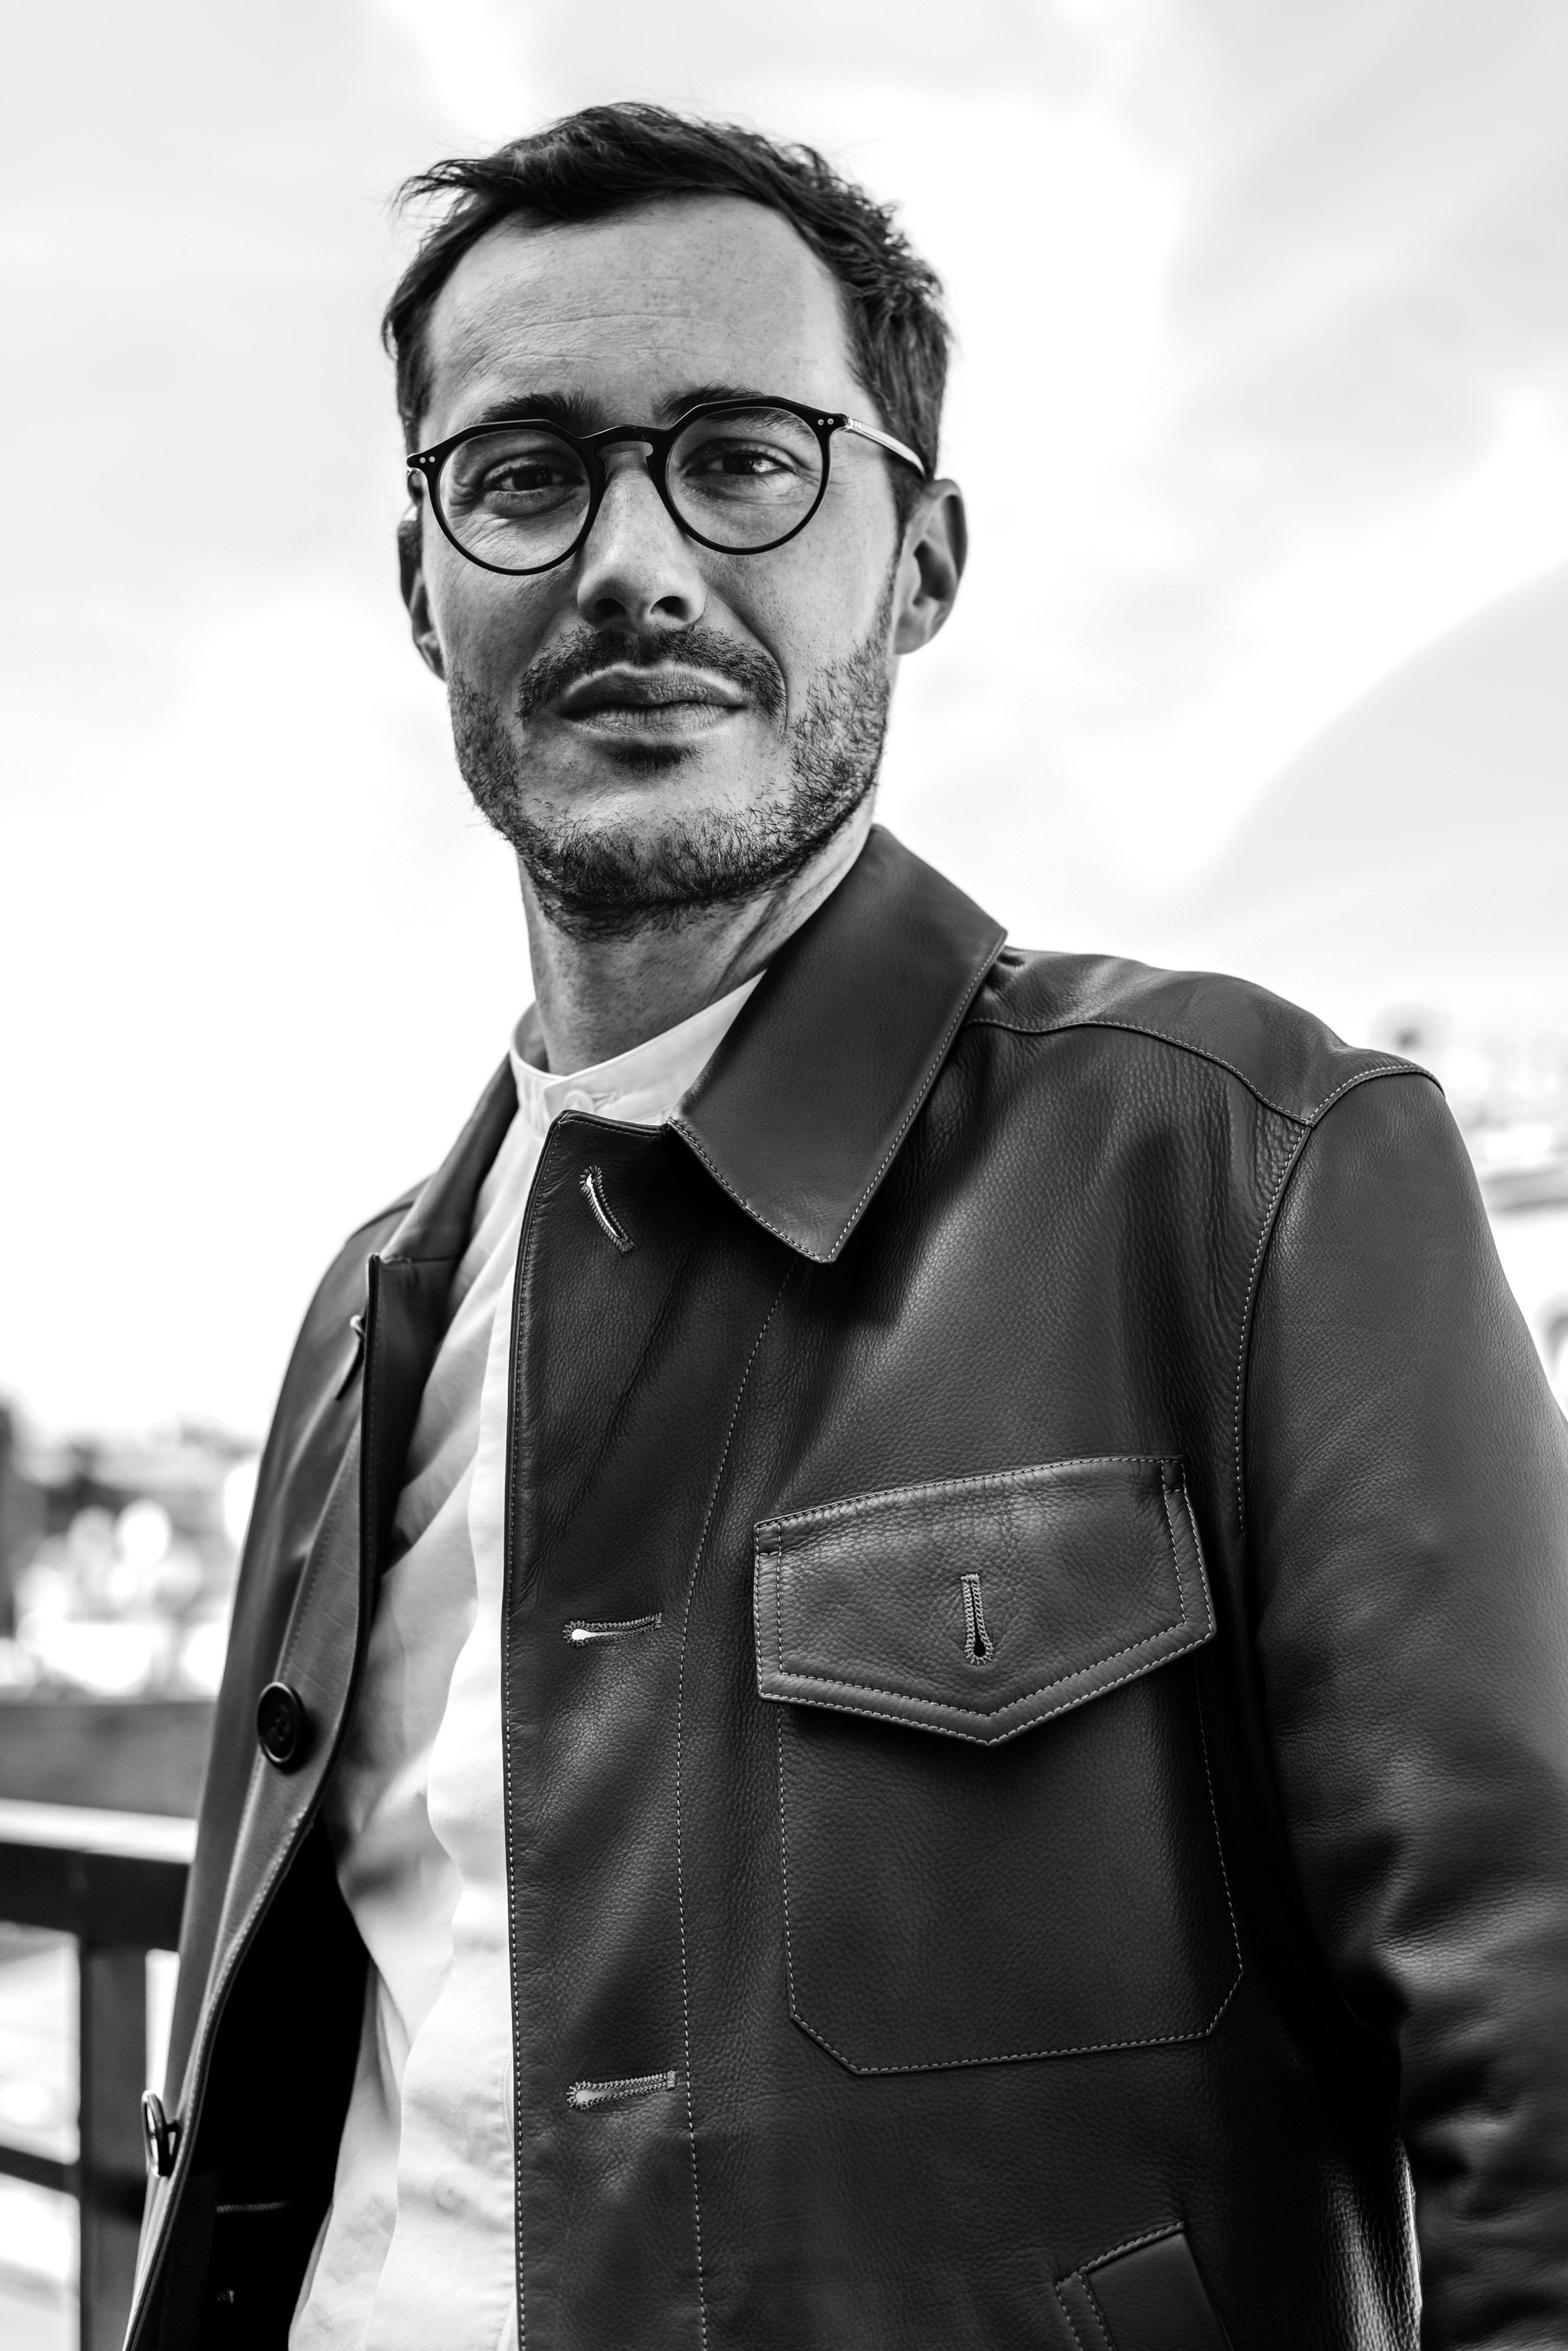 Bastien Daguzan of Paco Rabanne